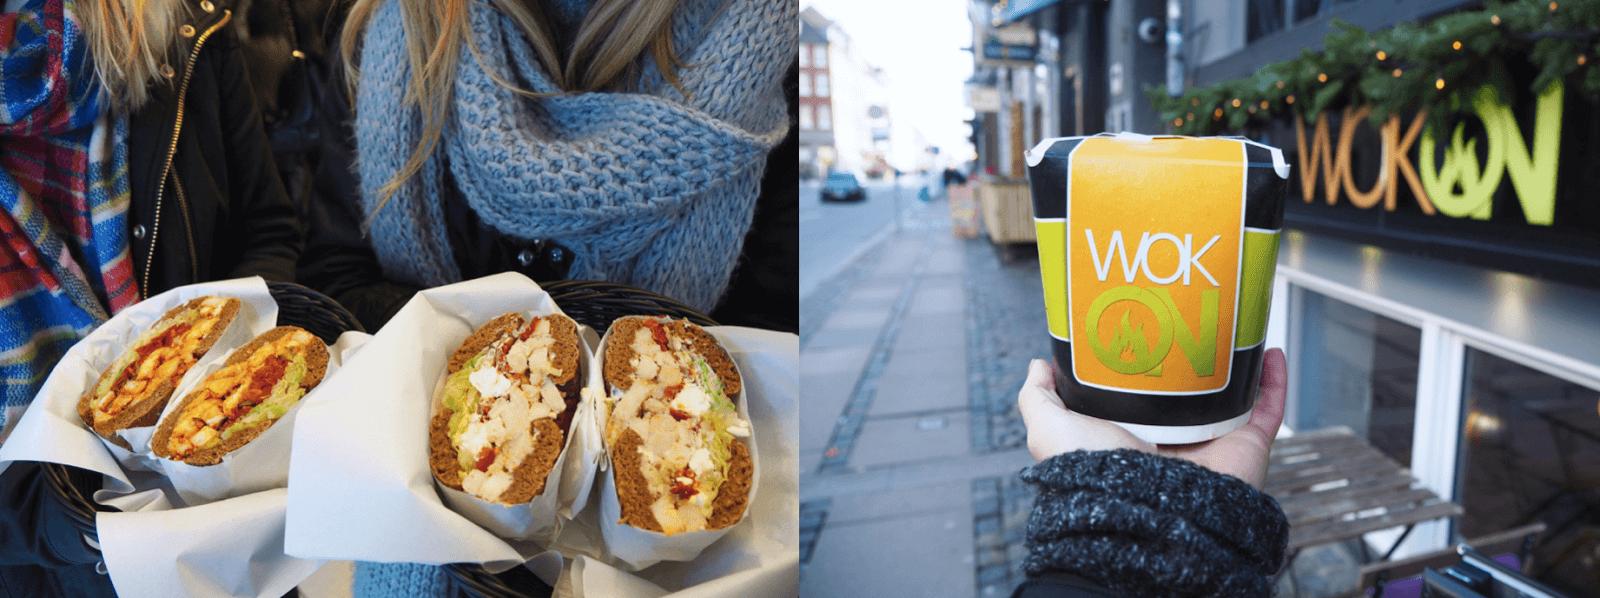 10 WAYS TO SAVE MONEY ON YOUR CITY BREAK TO COPENHAGEN